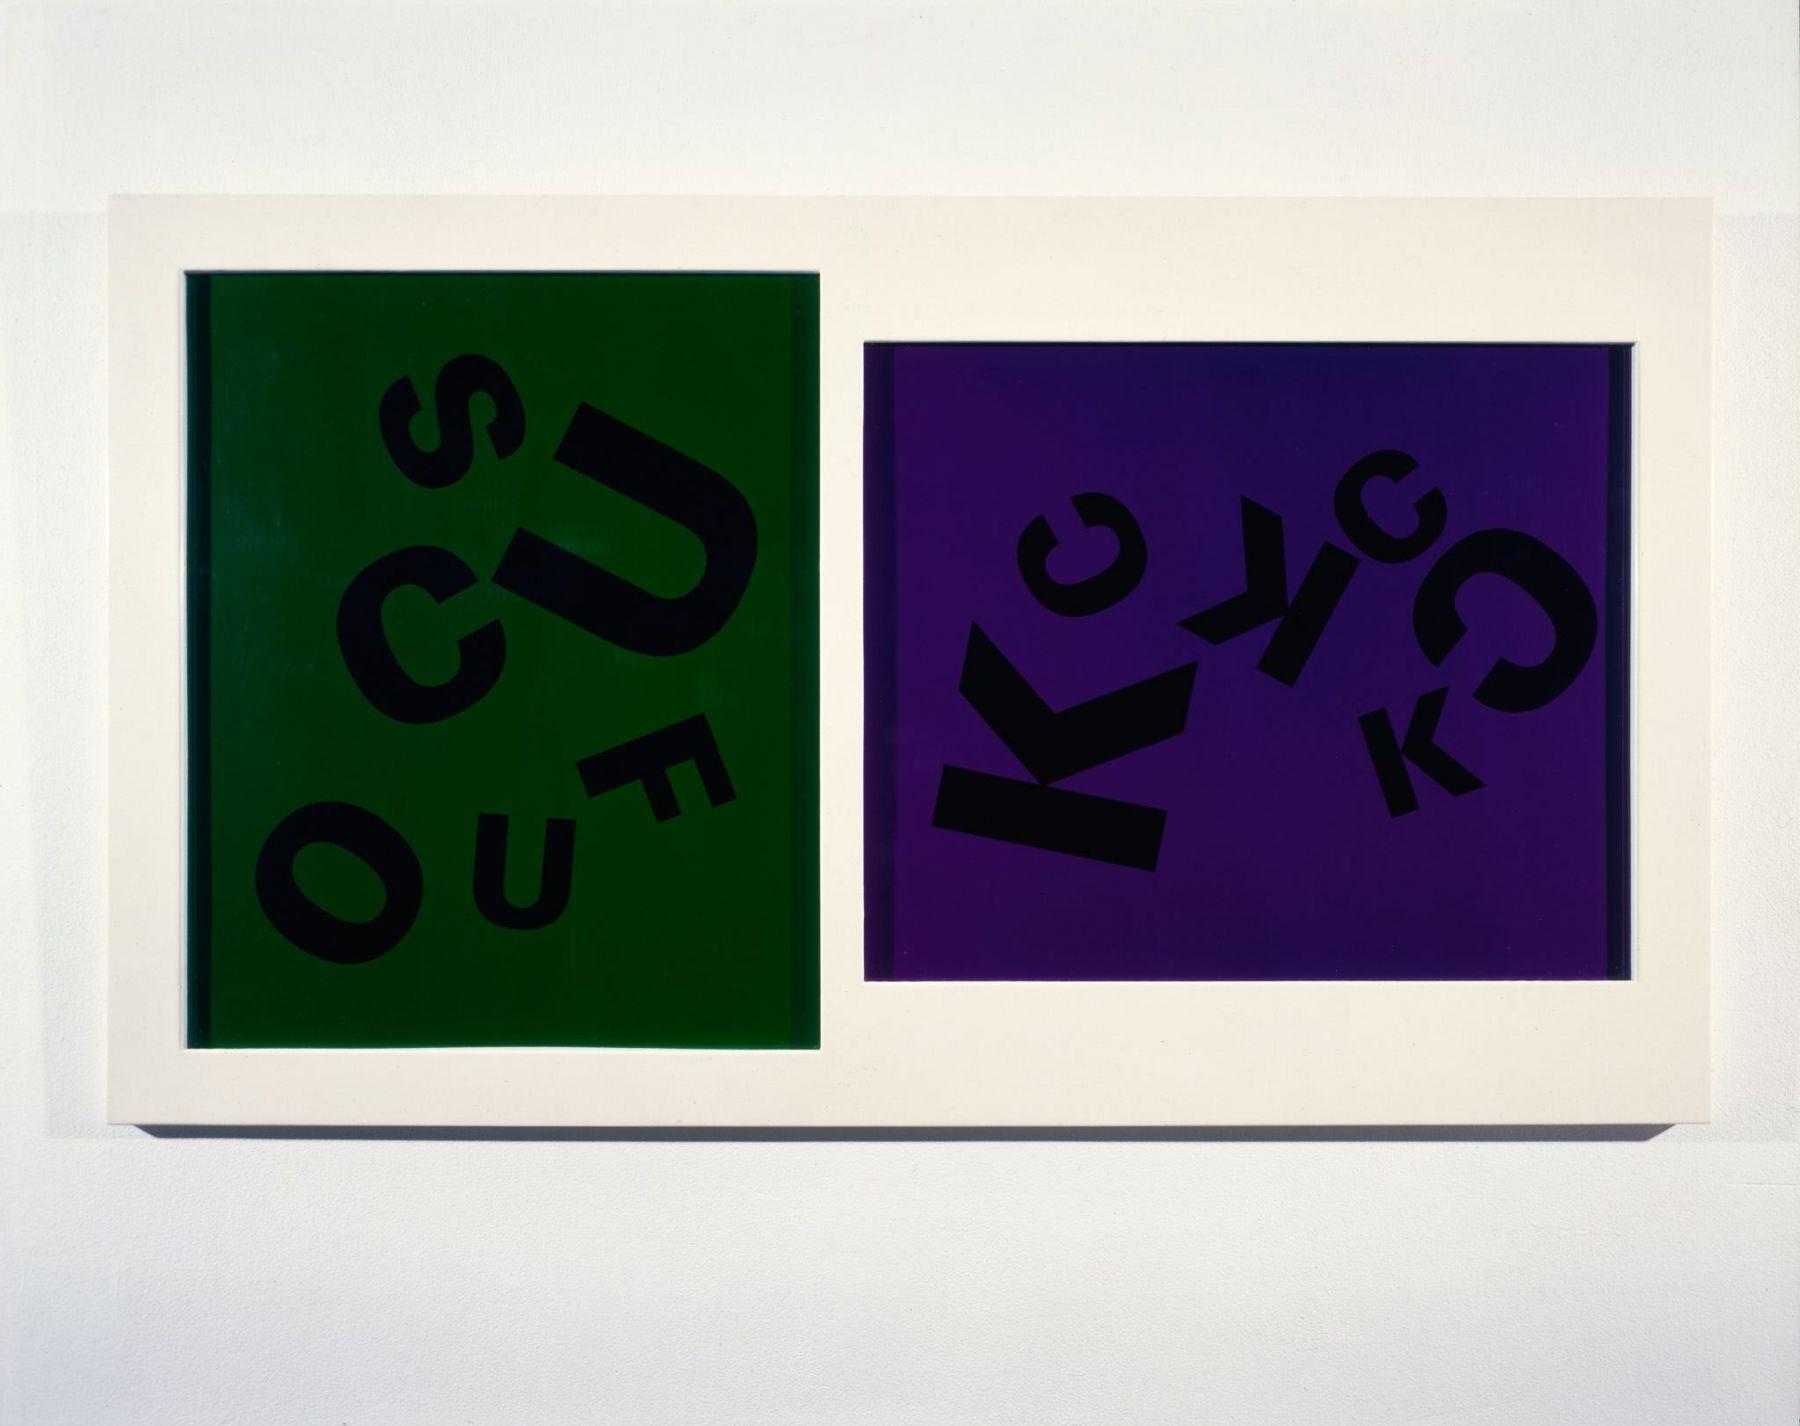 Larry Johnson, Untitled (Fuck, Suck, Cock), 1985